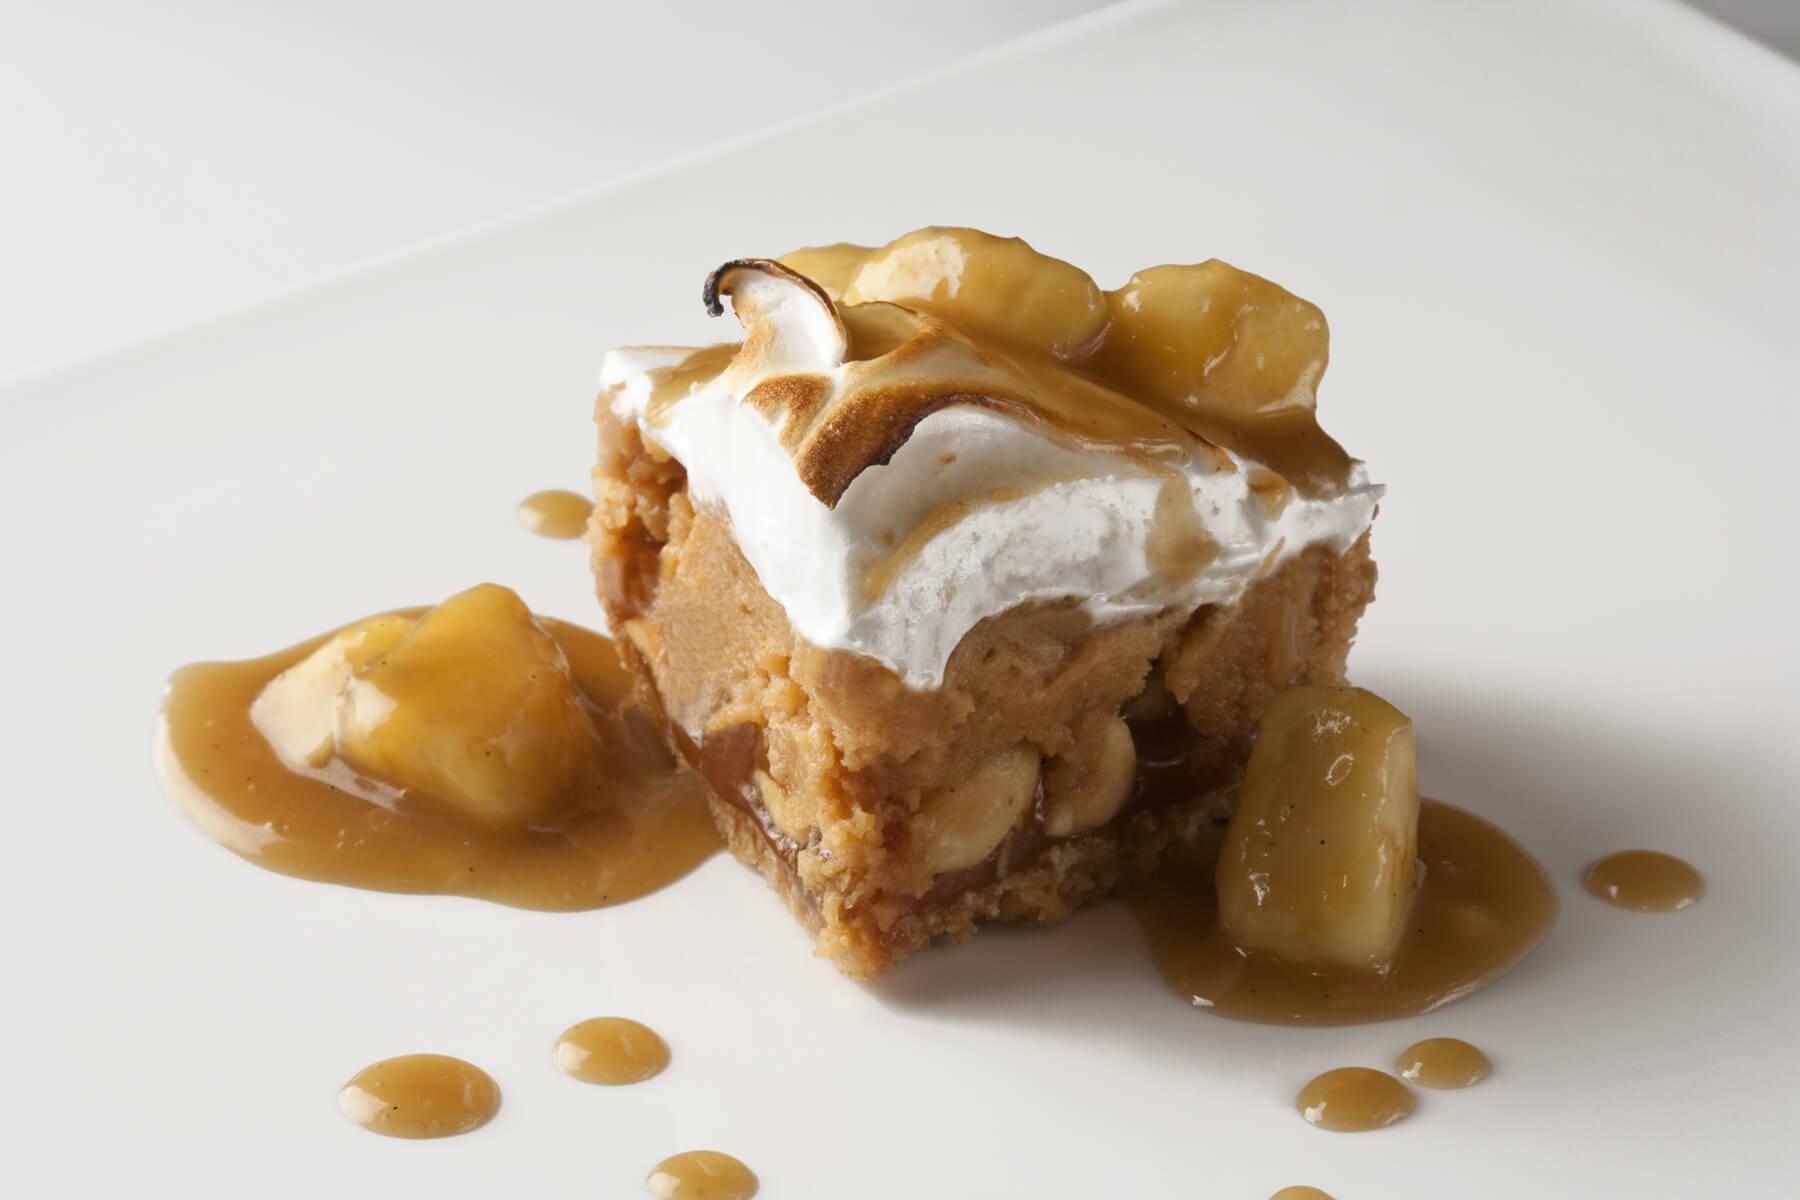 Fluffer Nutter Pie by Pastry Chef Jennifer Giblin. Photo by Battman. Pies. ebook, cookbook